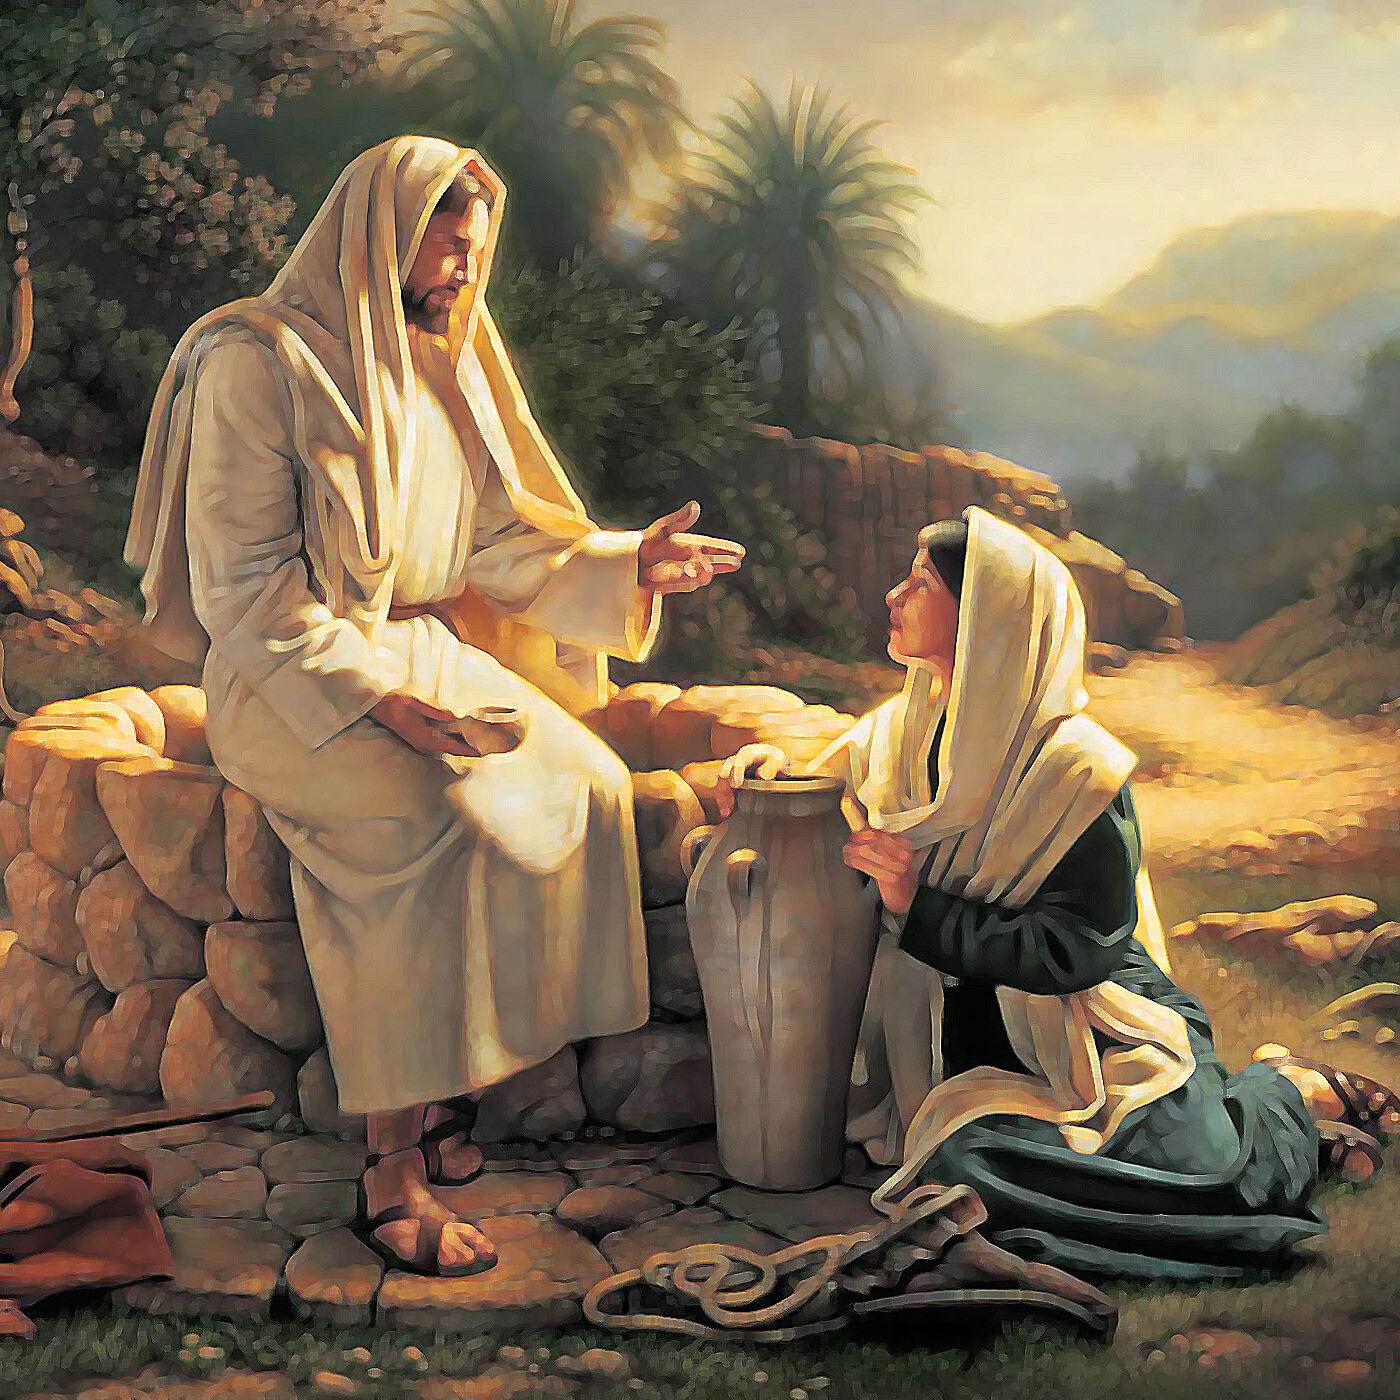 riflessioni sul Vangelo di Mercoledì 7 Aprile 2021 (Lc 24, 13-35)